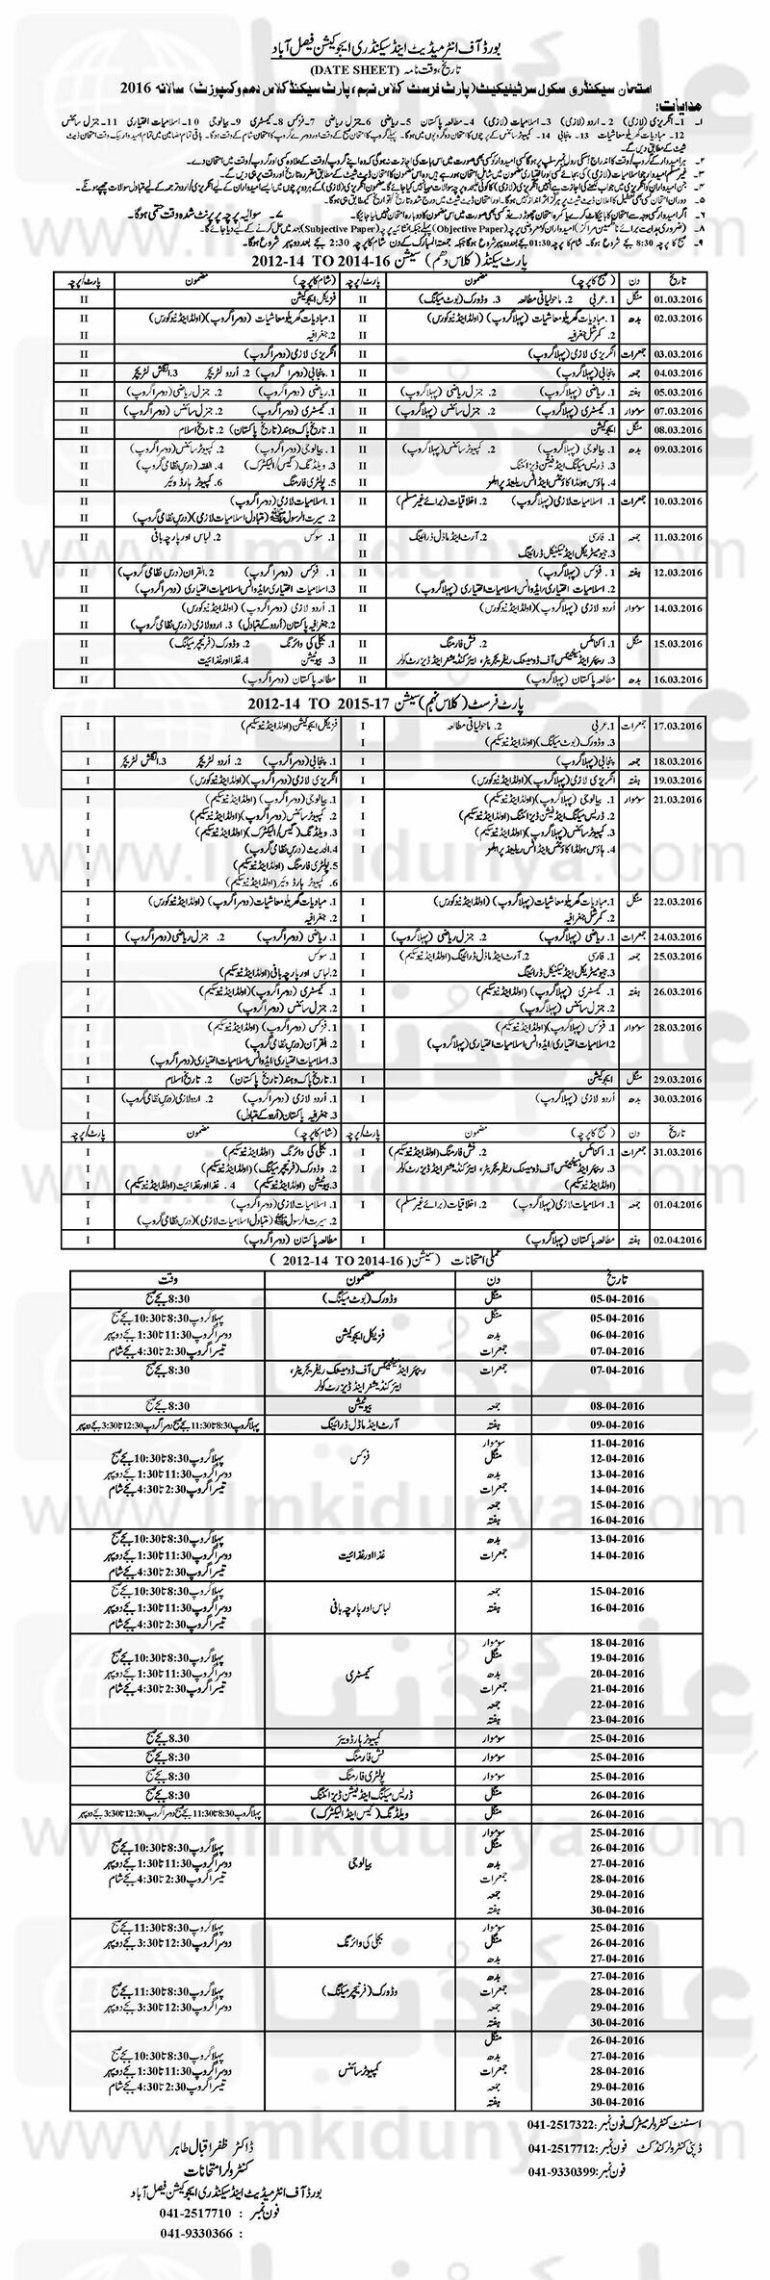 BISE Faisalabad Board 9th Class Date Sheet 2016